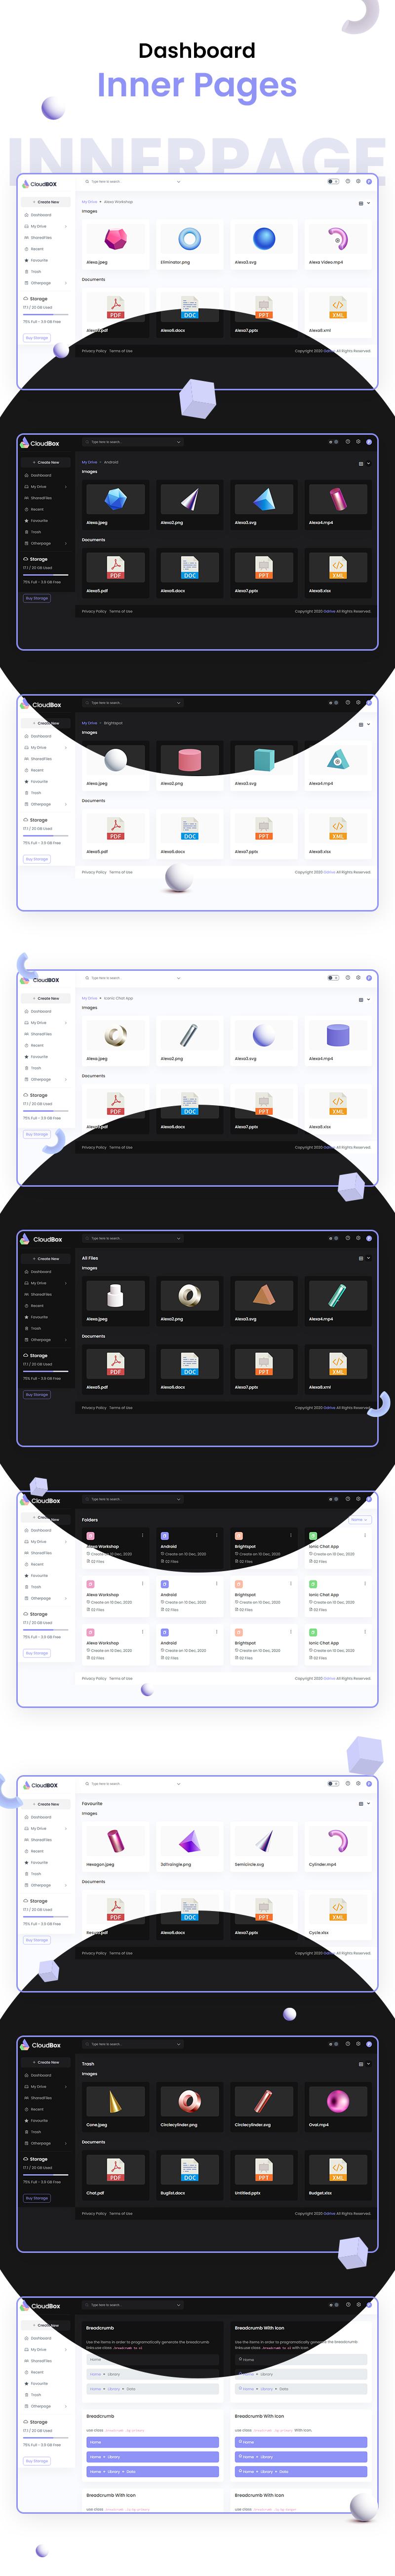 CloudBox | VueJS, HTML File Storage Admin Dashboard Template - 10 vuejs html file storage admin dashboard template CloudBox 4